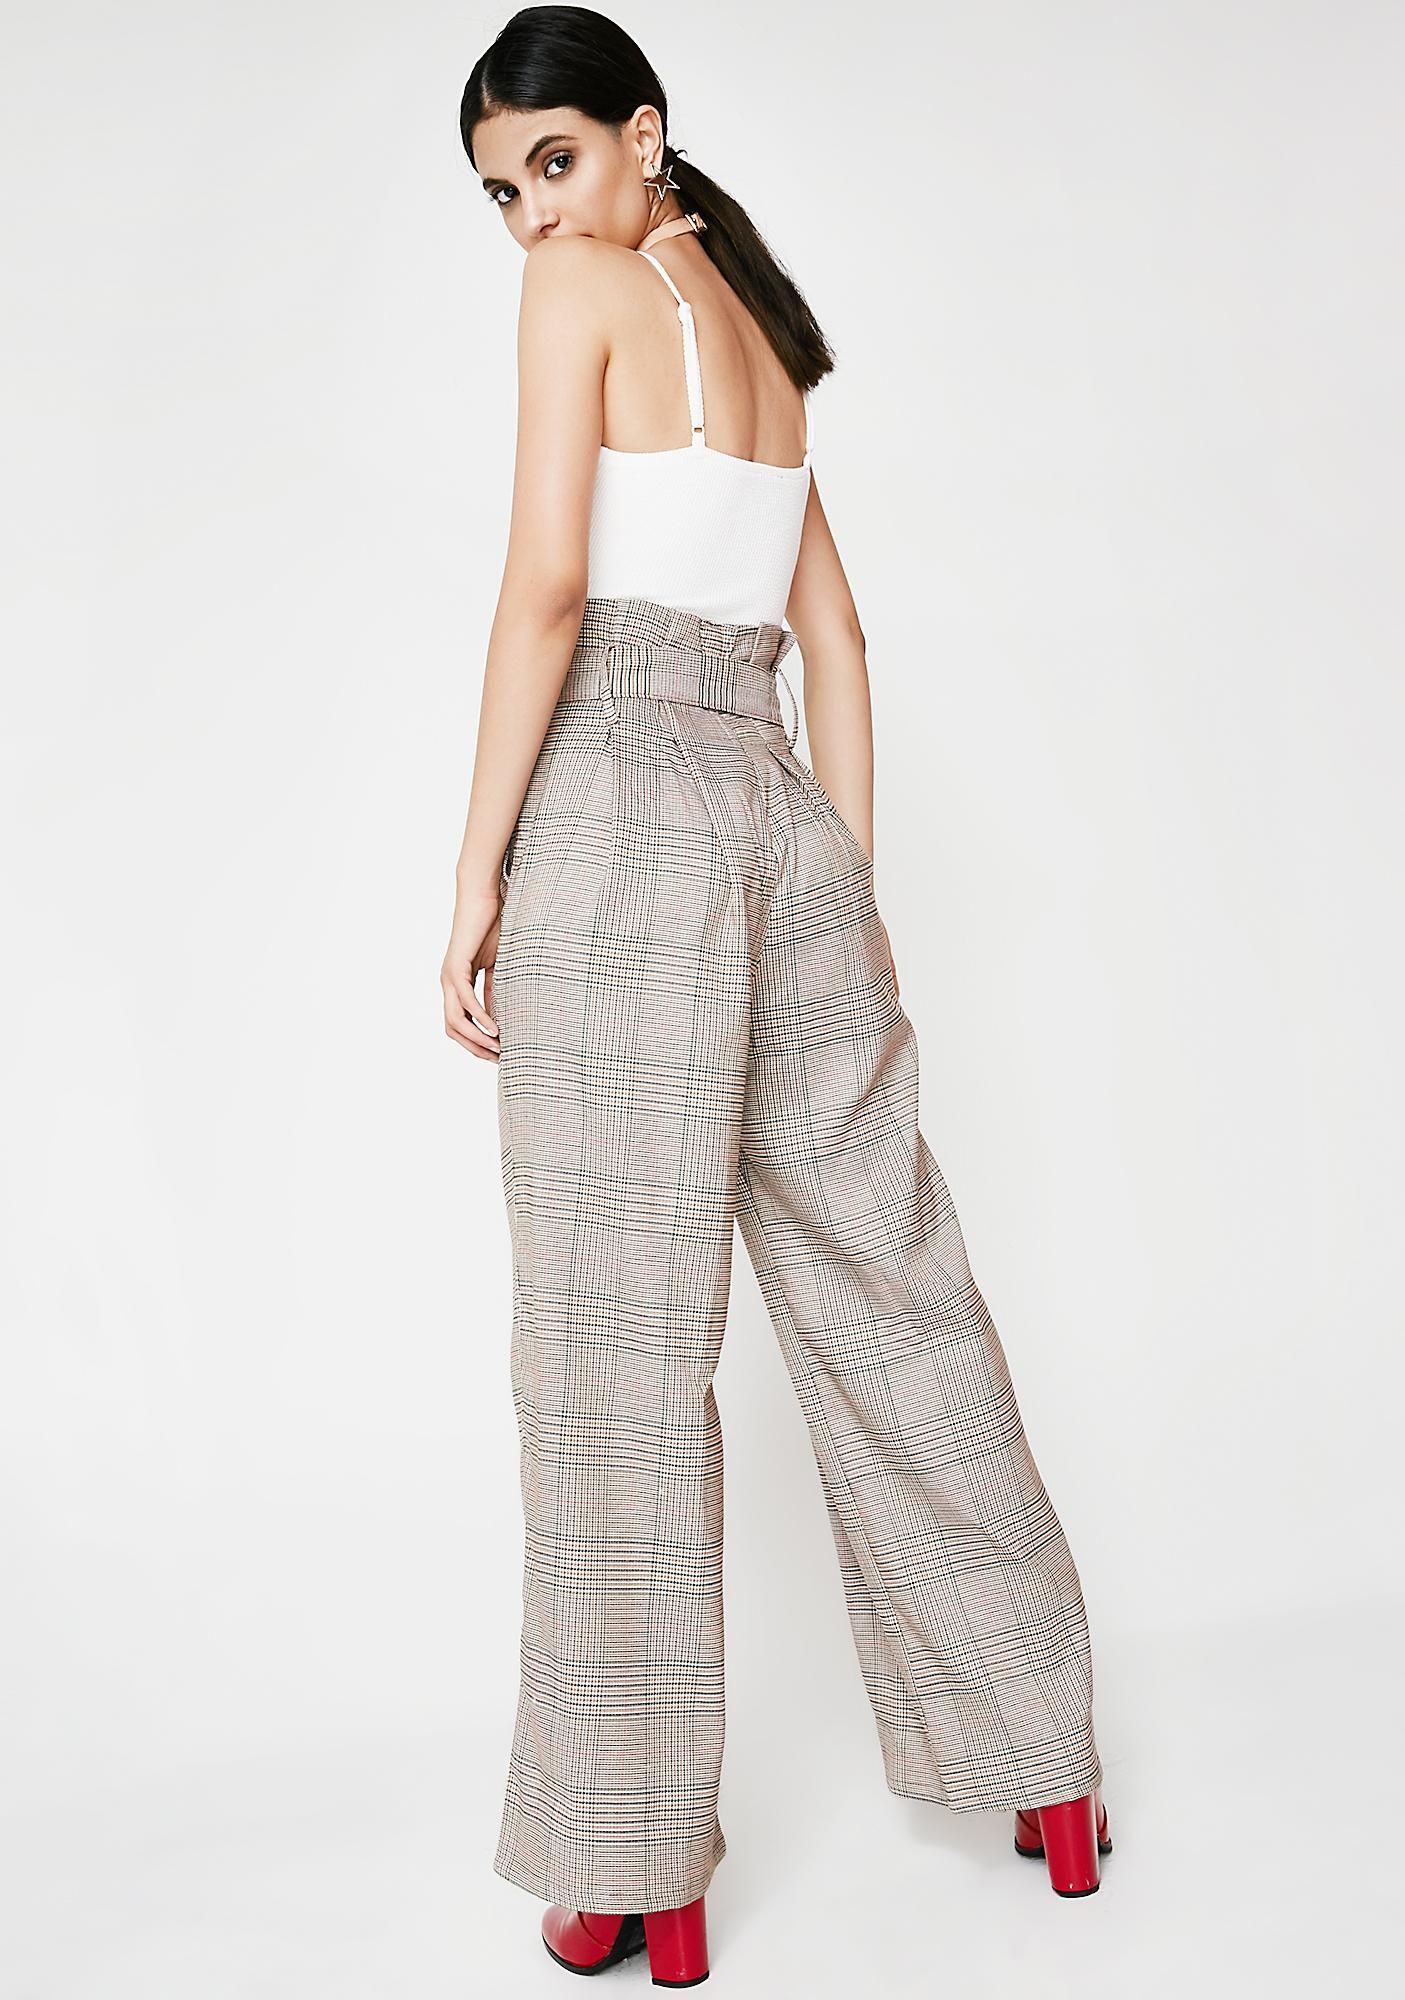 Keep It Twisted Plaid Pants